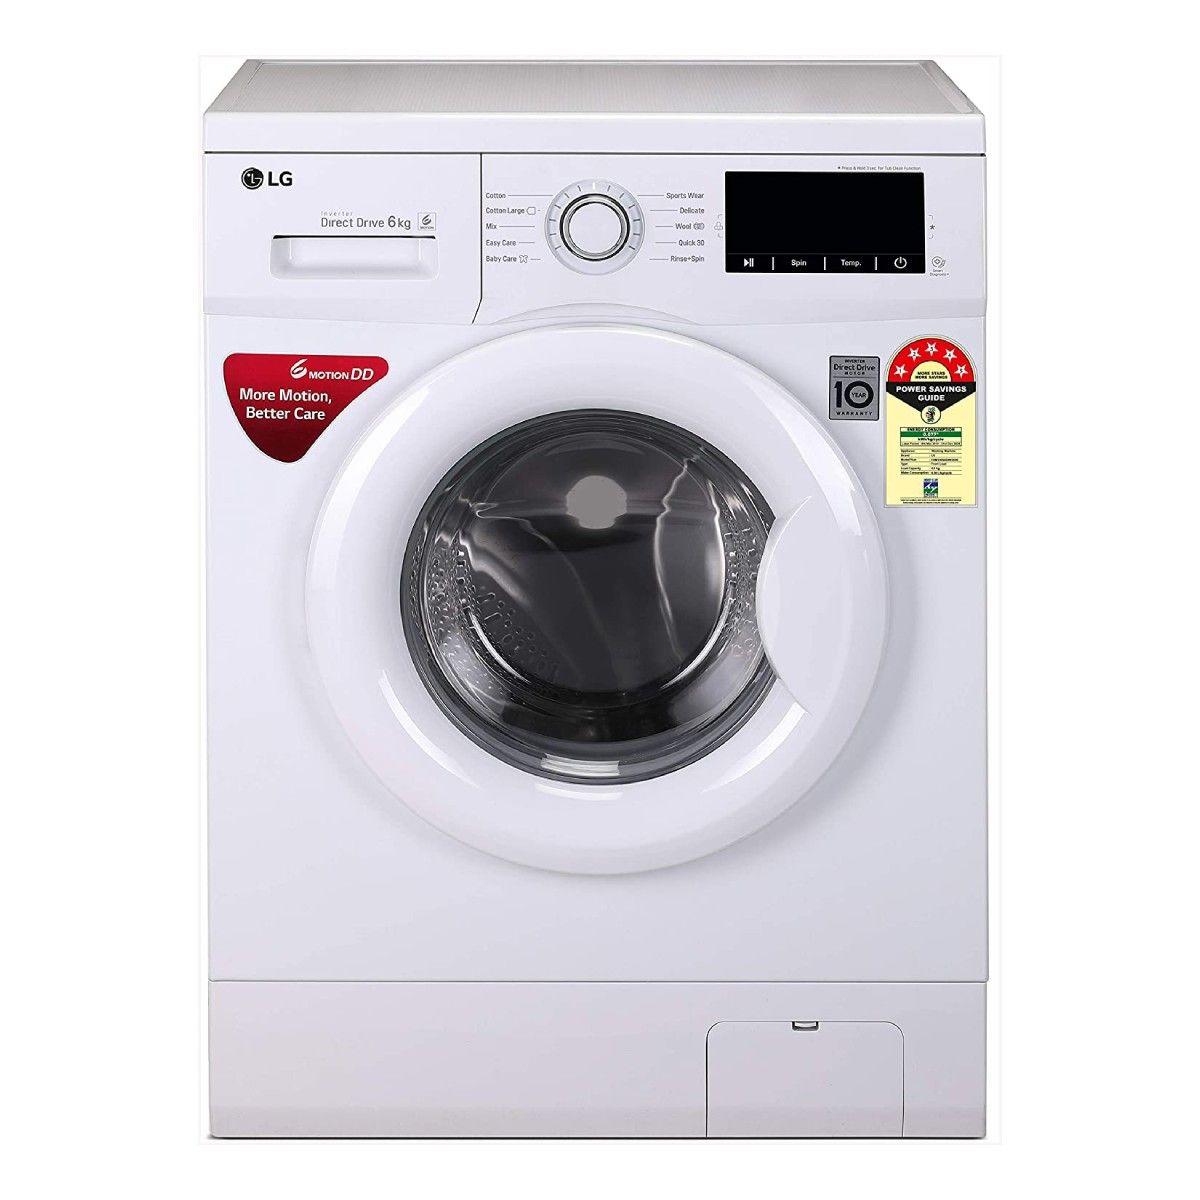 LG 6 kg Inverter Fully-Automatic Front Loading Washing Machine (FHM1006ADW)